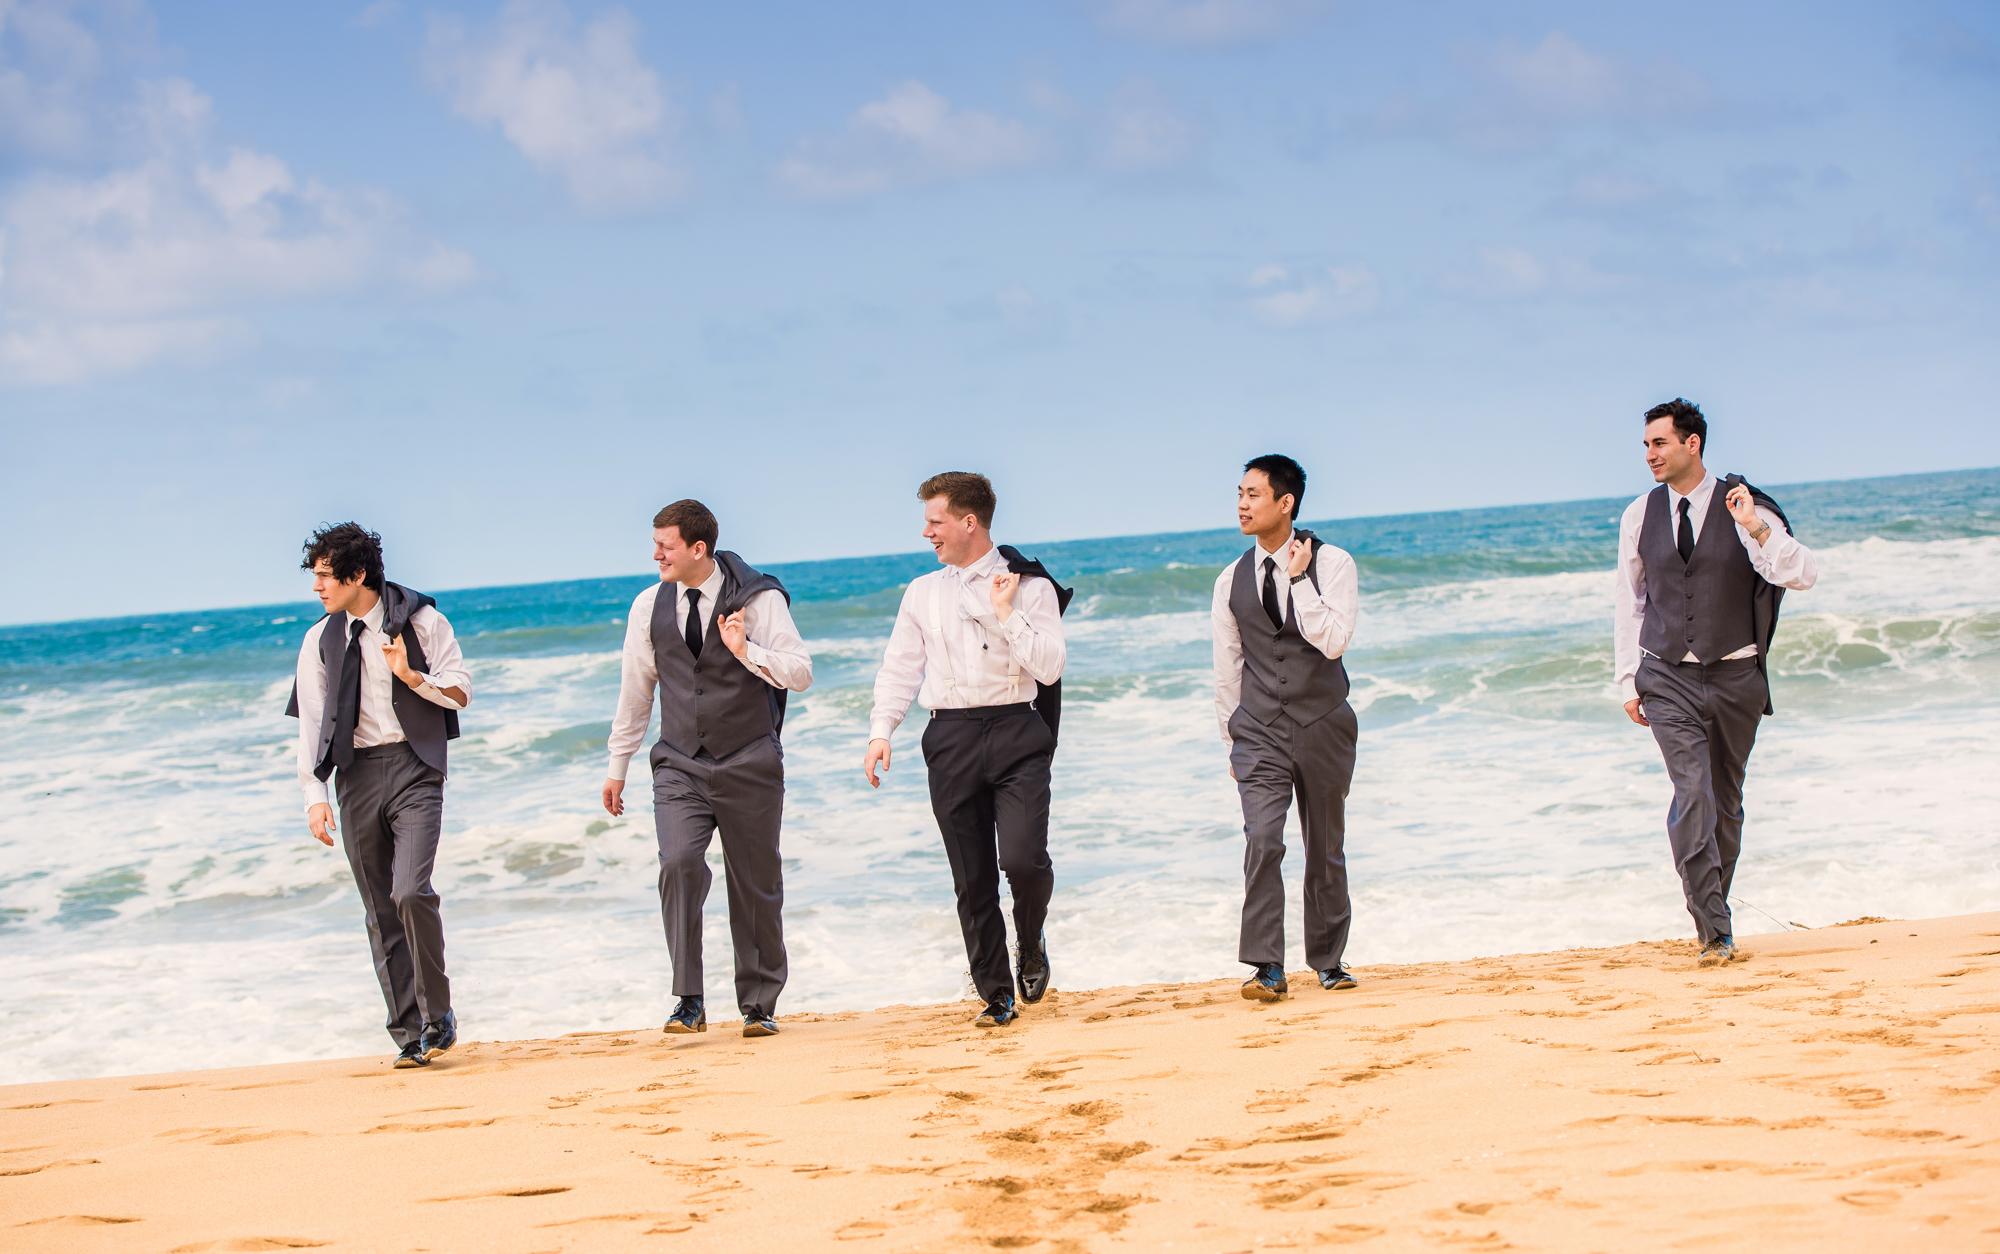 Yifan_Zhang_Geoff_Oberhofer_Carlin_Ma_wedding-1127.jpg